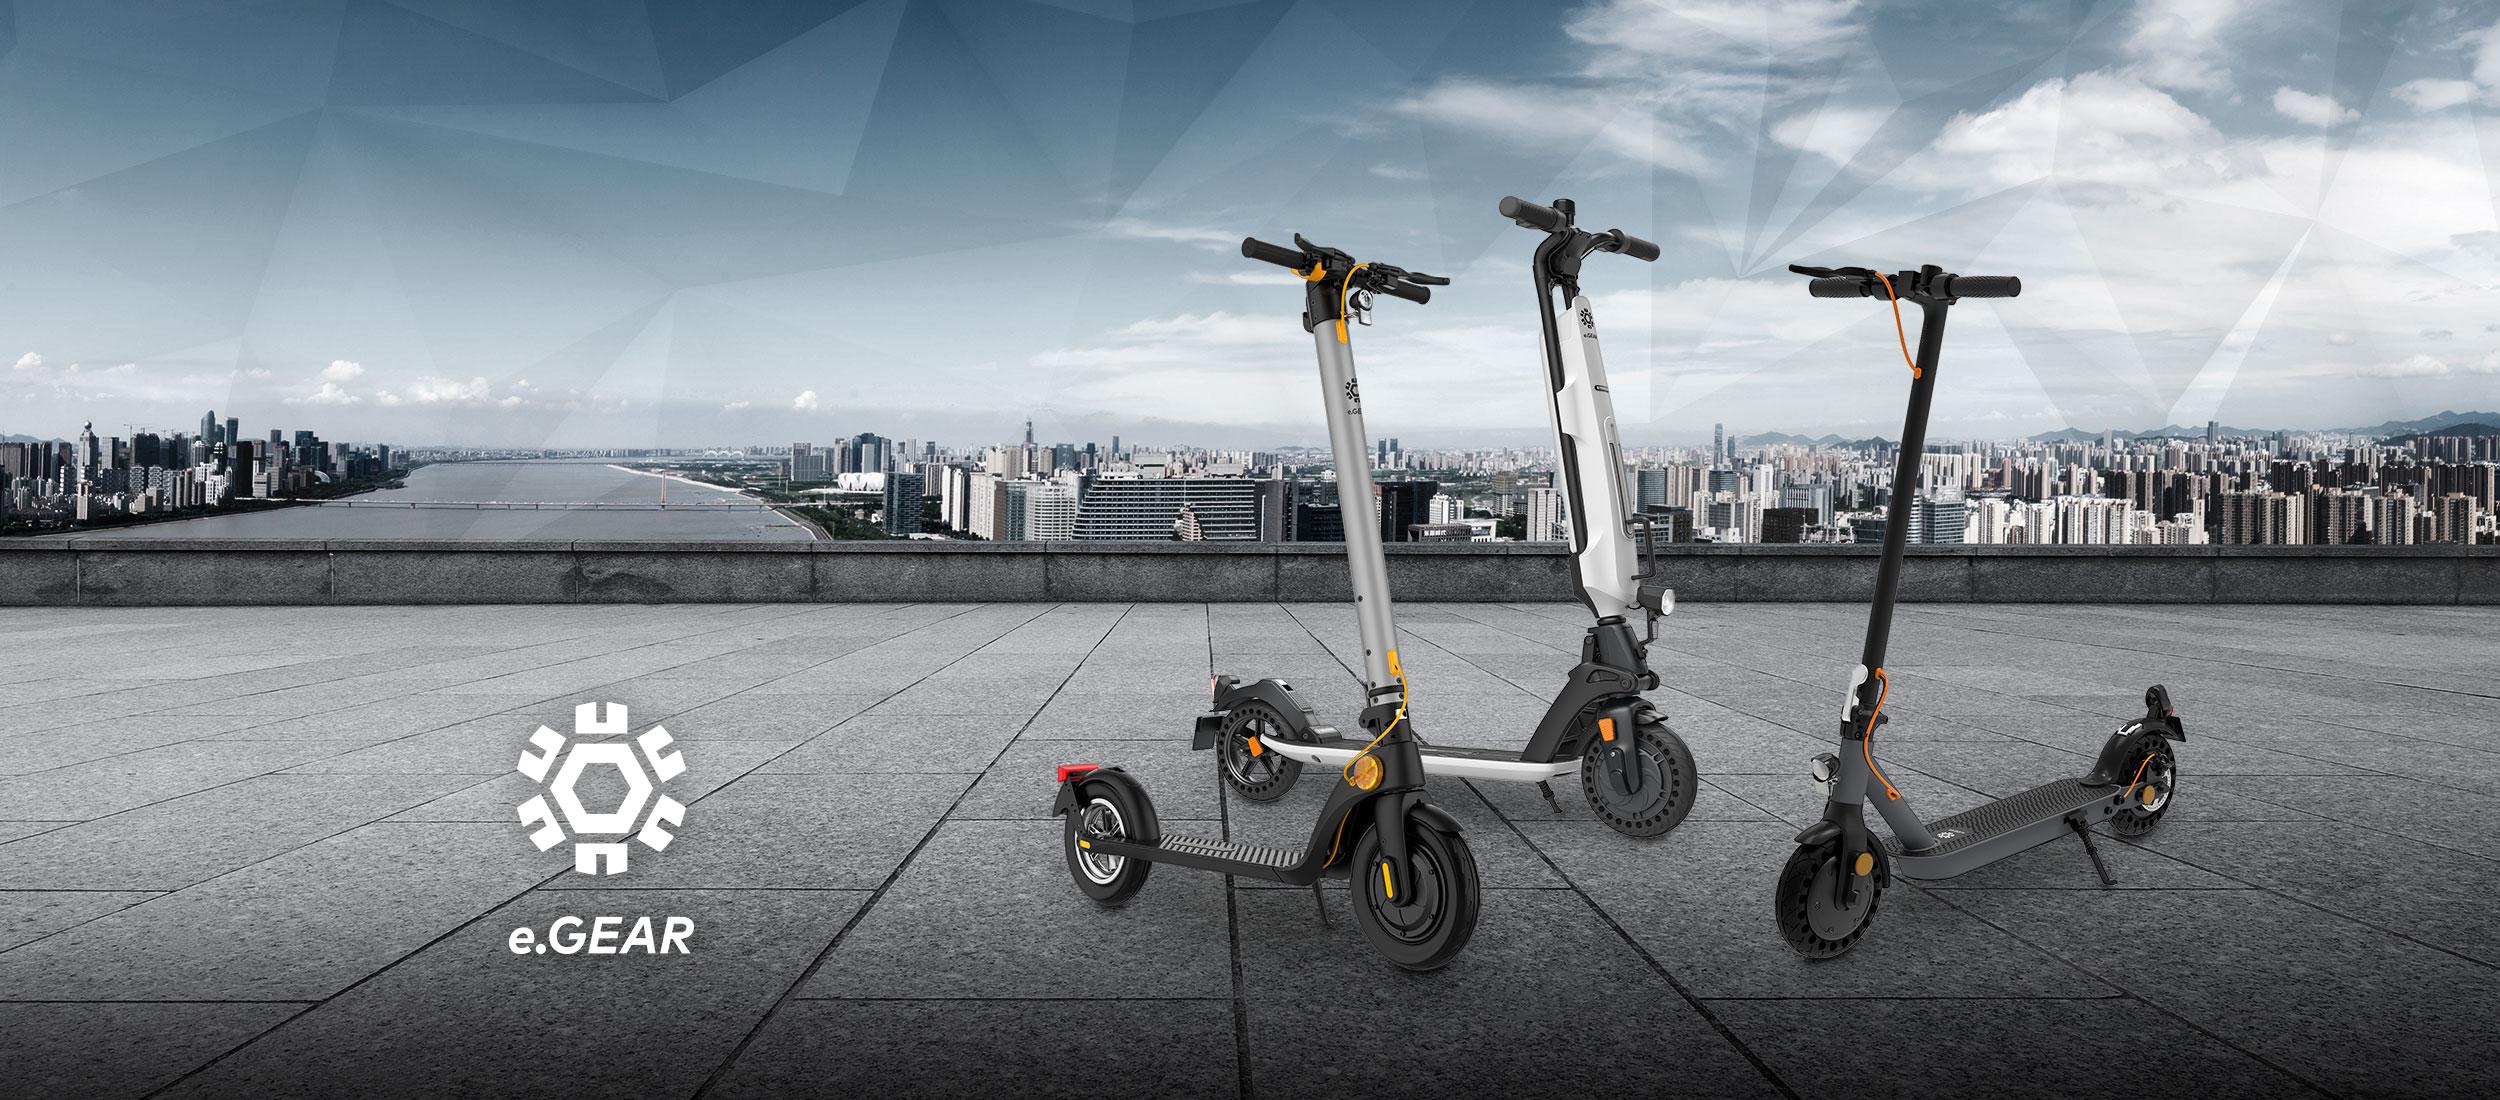 eScooter Trekstor e.Gear vor Großstadtkulisse in grau